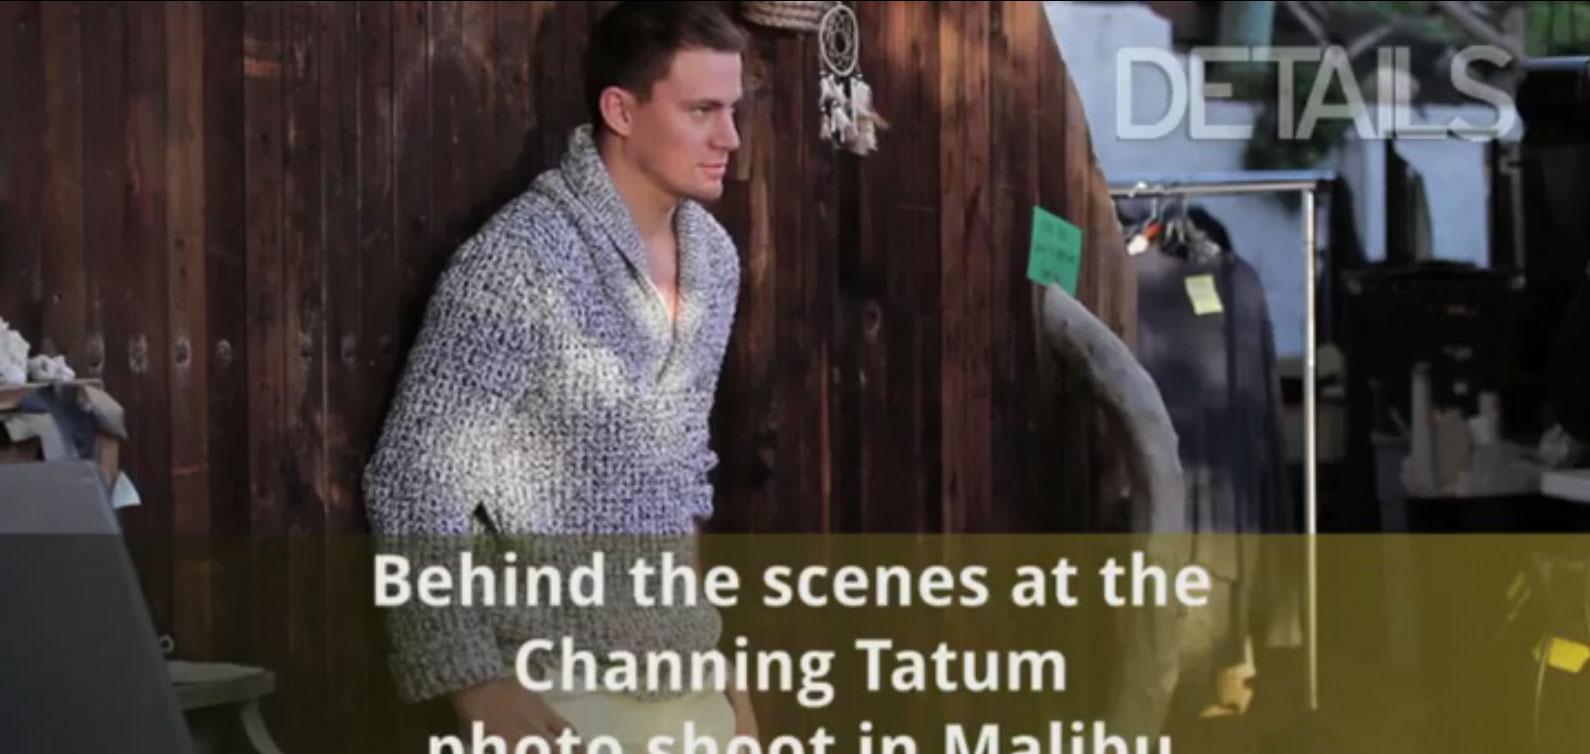 ChanningTatum-Details-BehindTheScenes-02.jpg